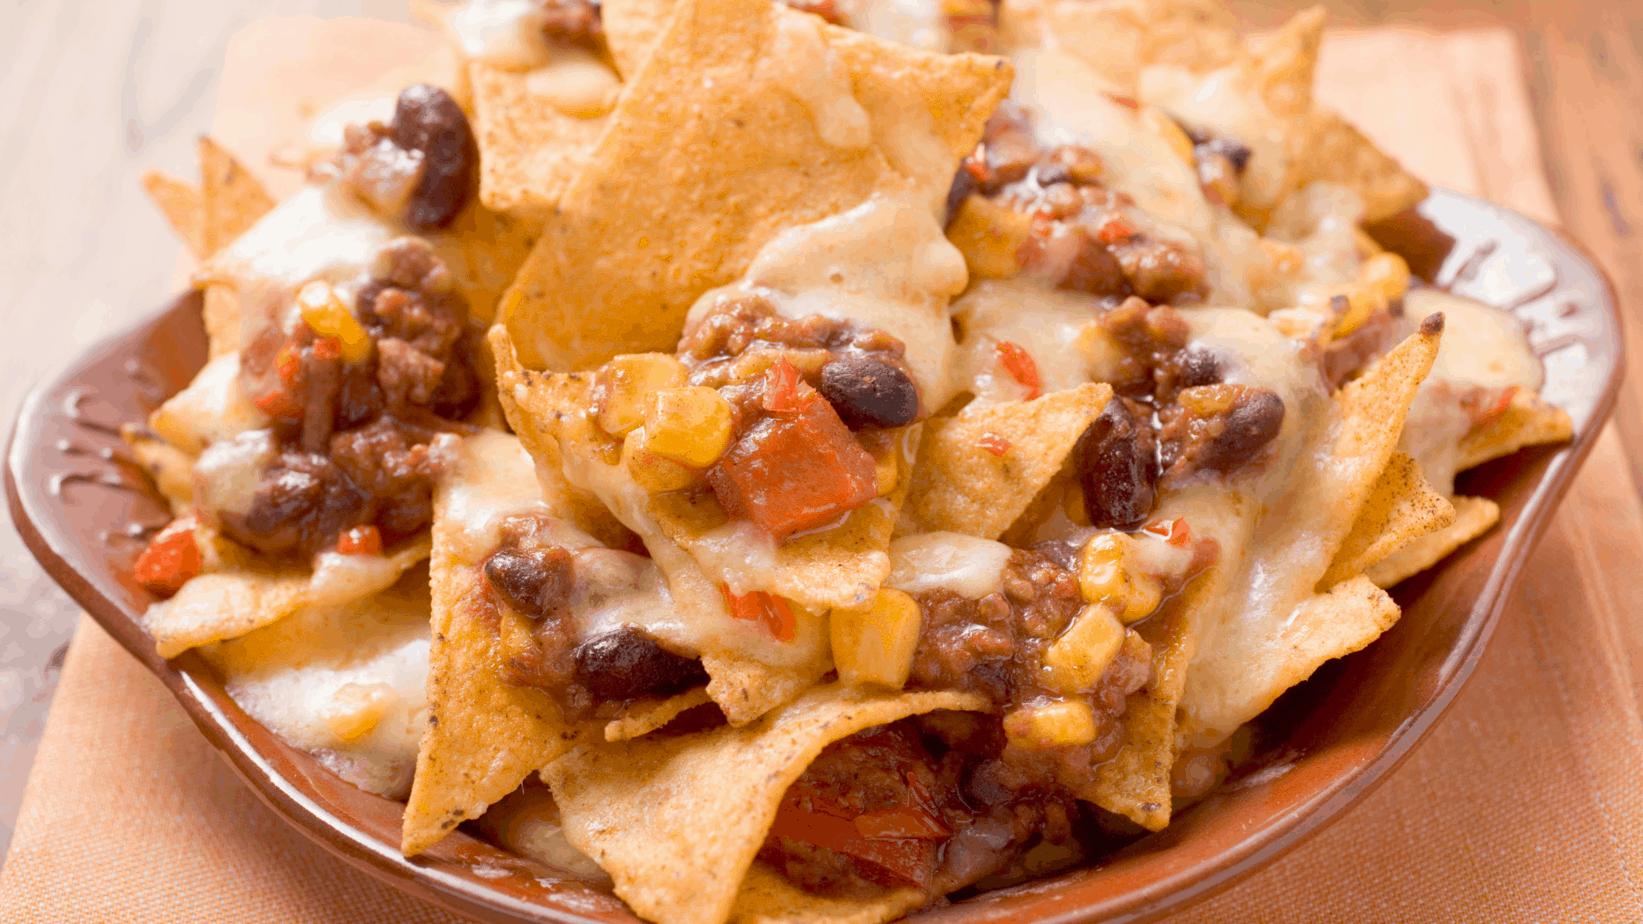 nacho recipe when you're broke